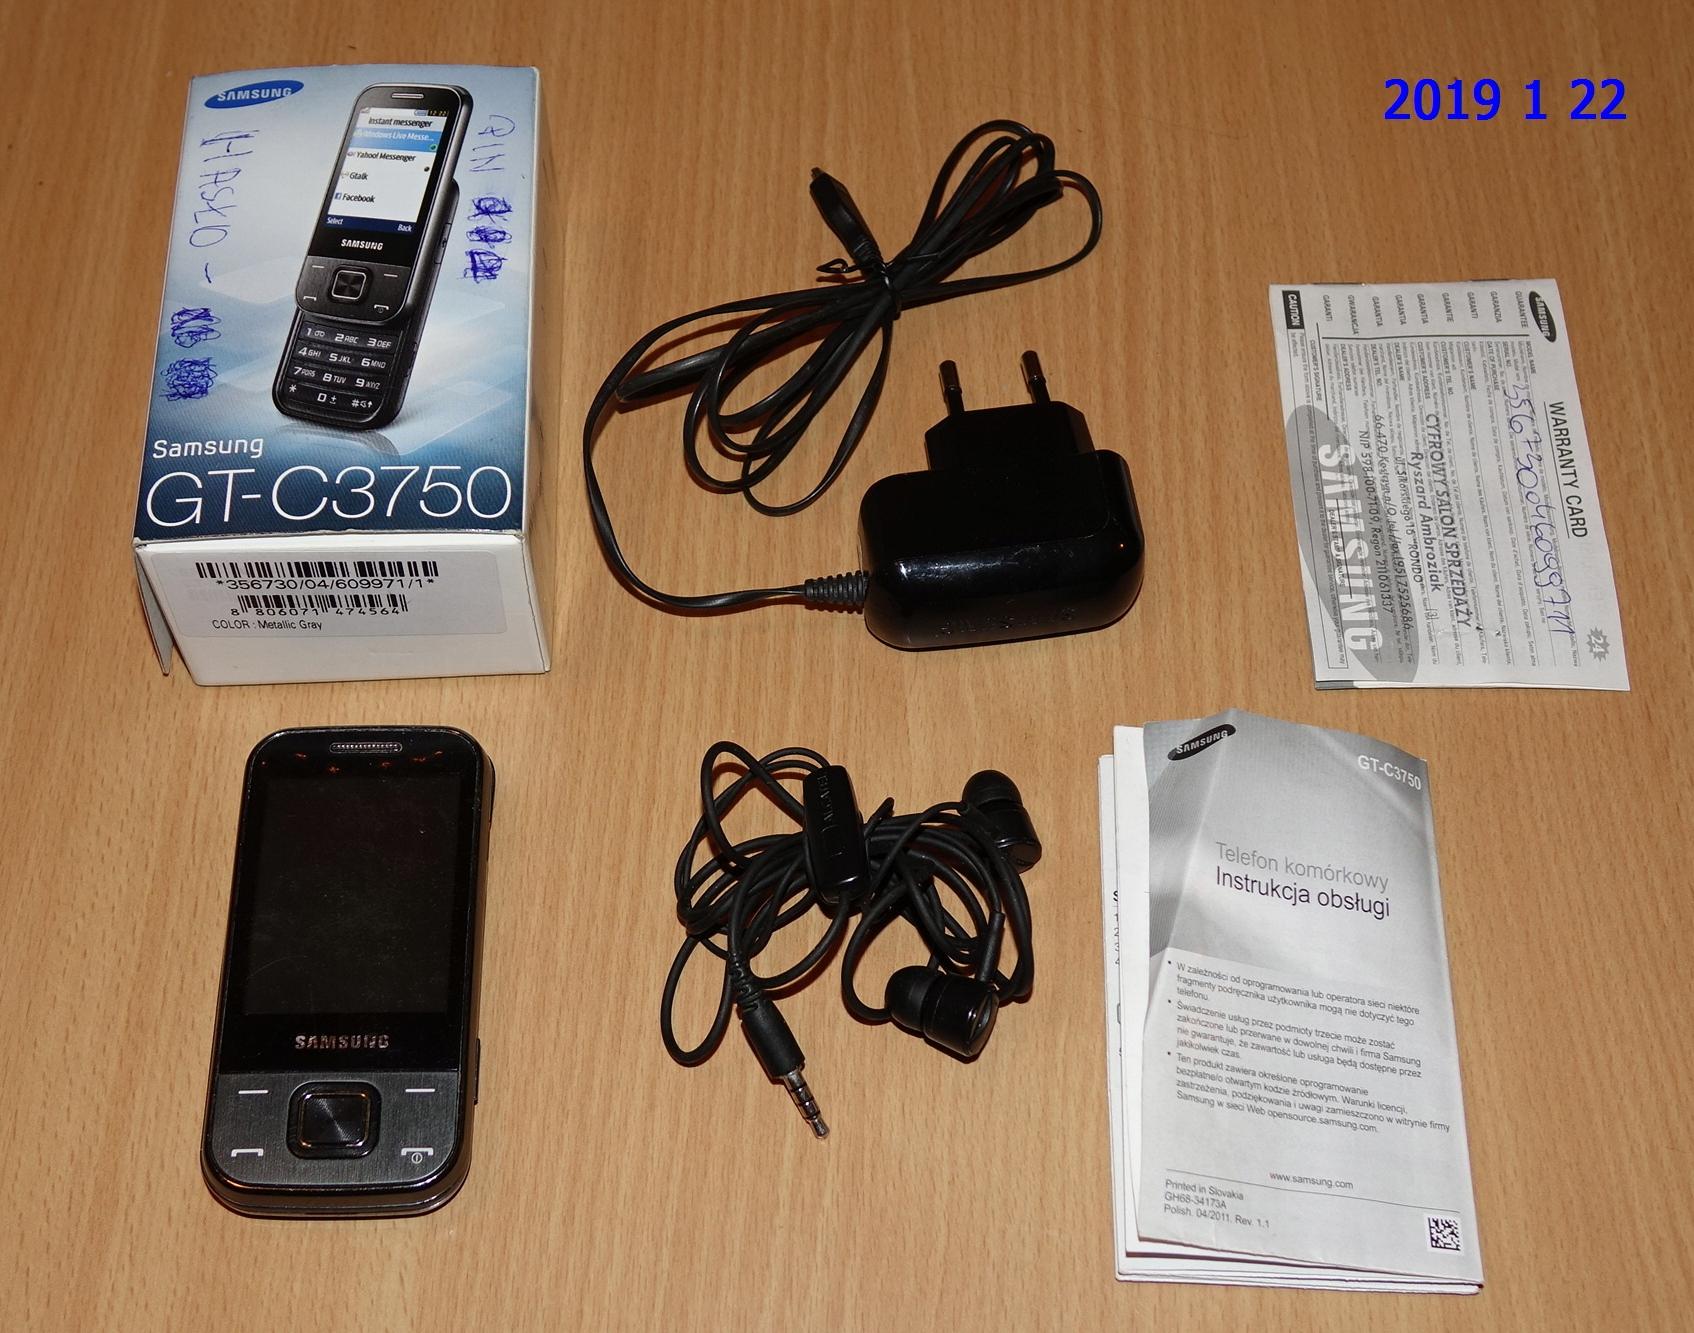 telefon GSM - SAMSUNG - GT-C3750 - KOMPLET